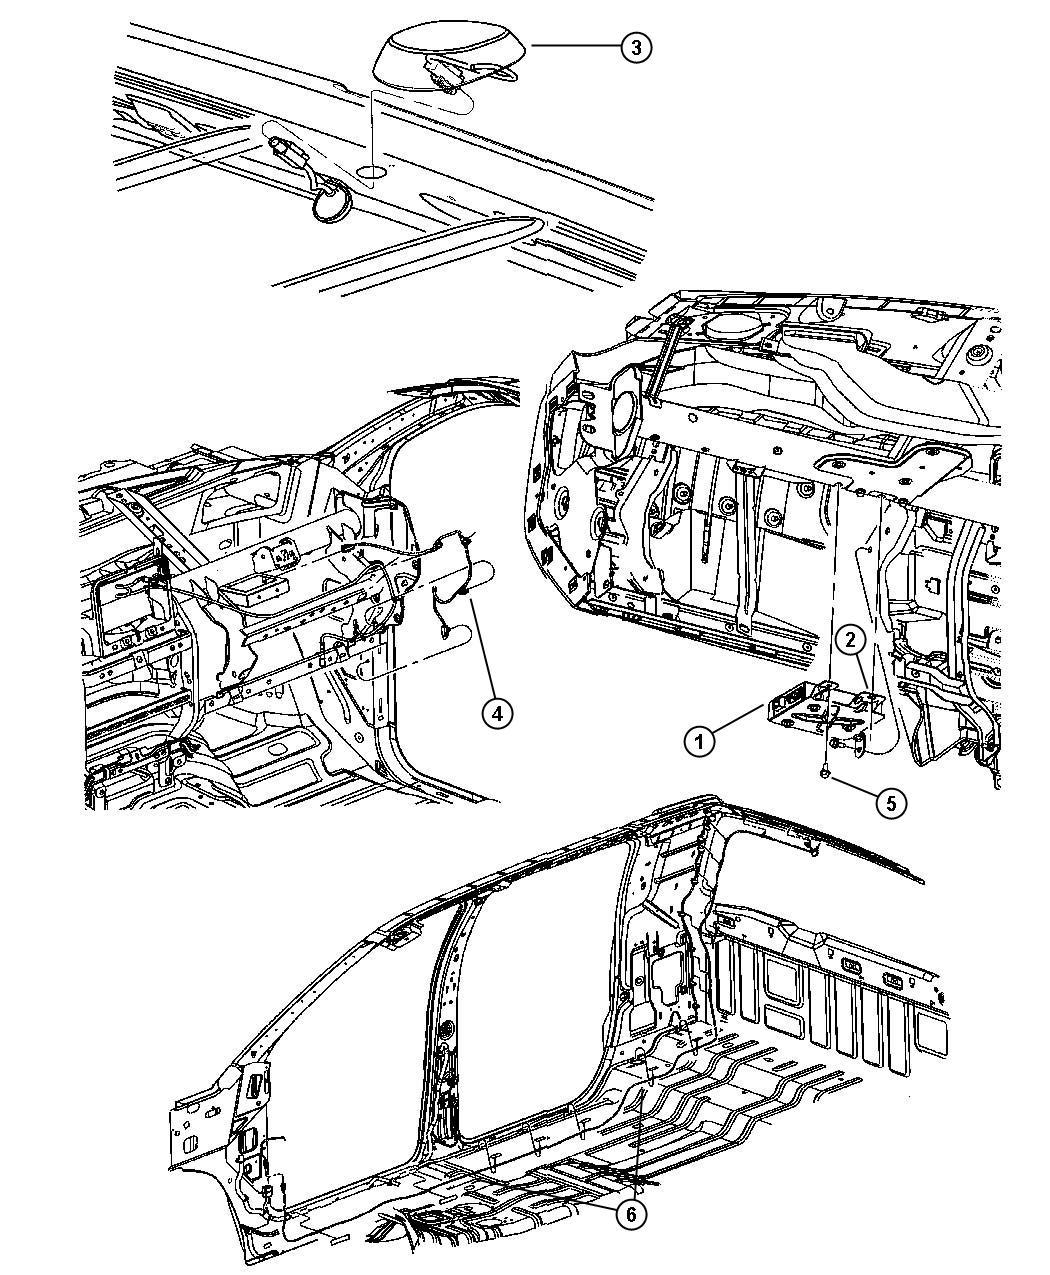 2008 Chrysler 300 Antenna. Satellite. Radioaero, streaming